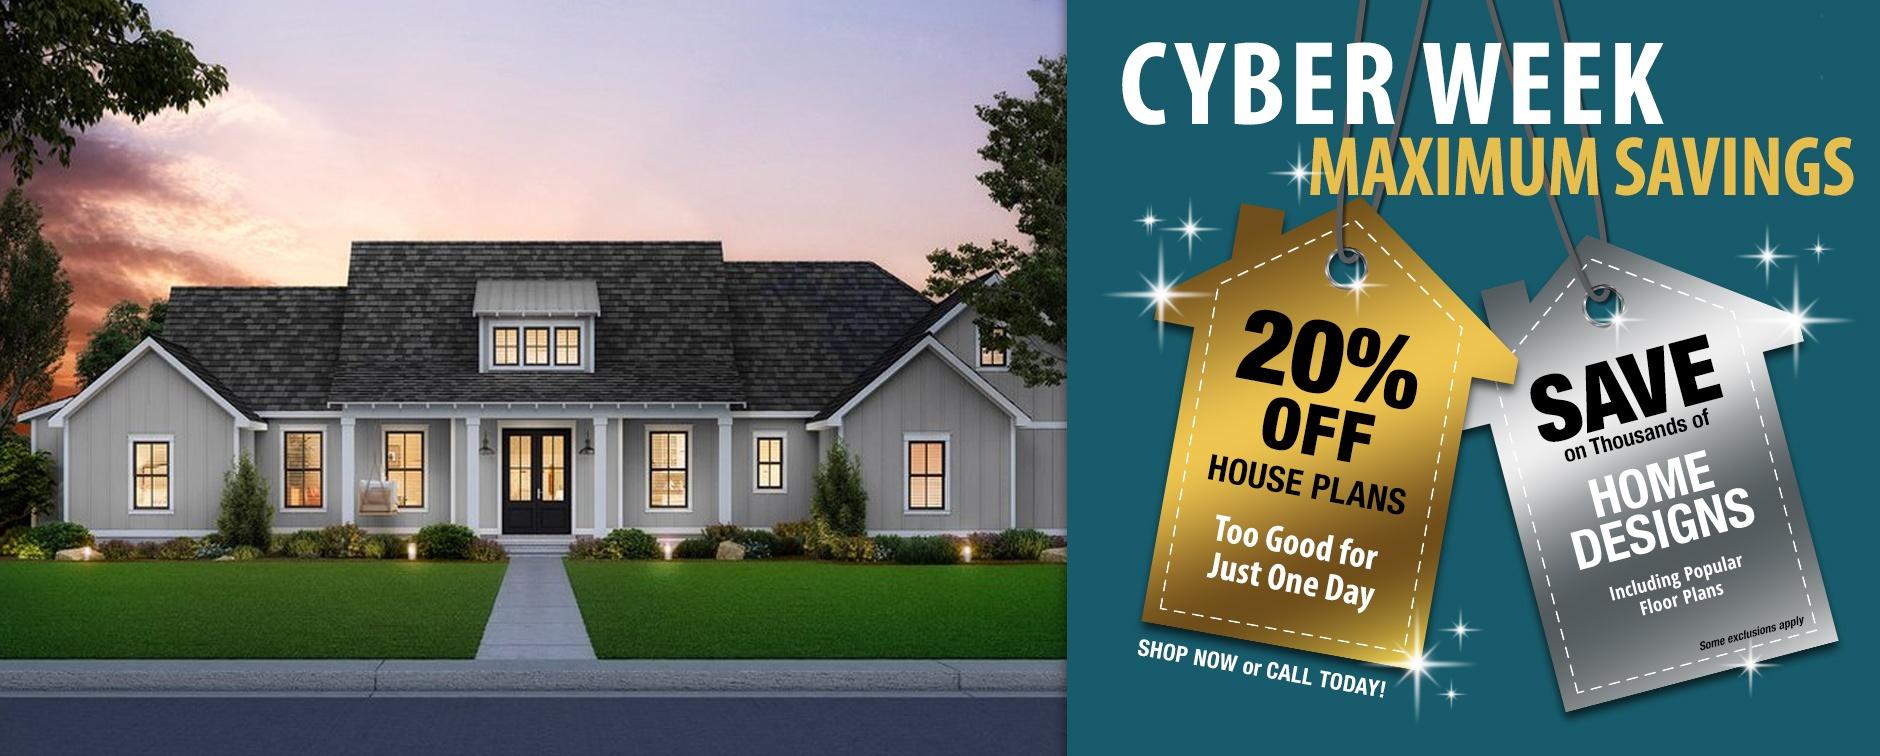 Builder House Plan Sale 20% Off